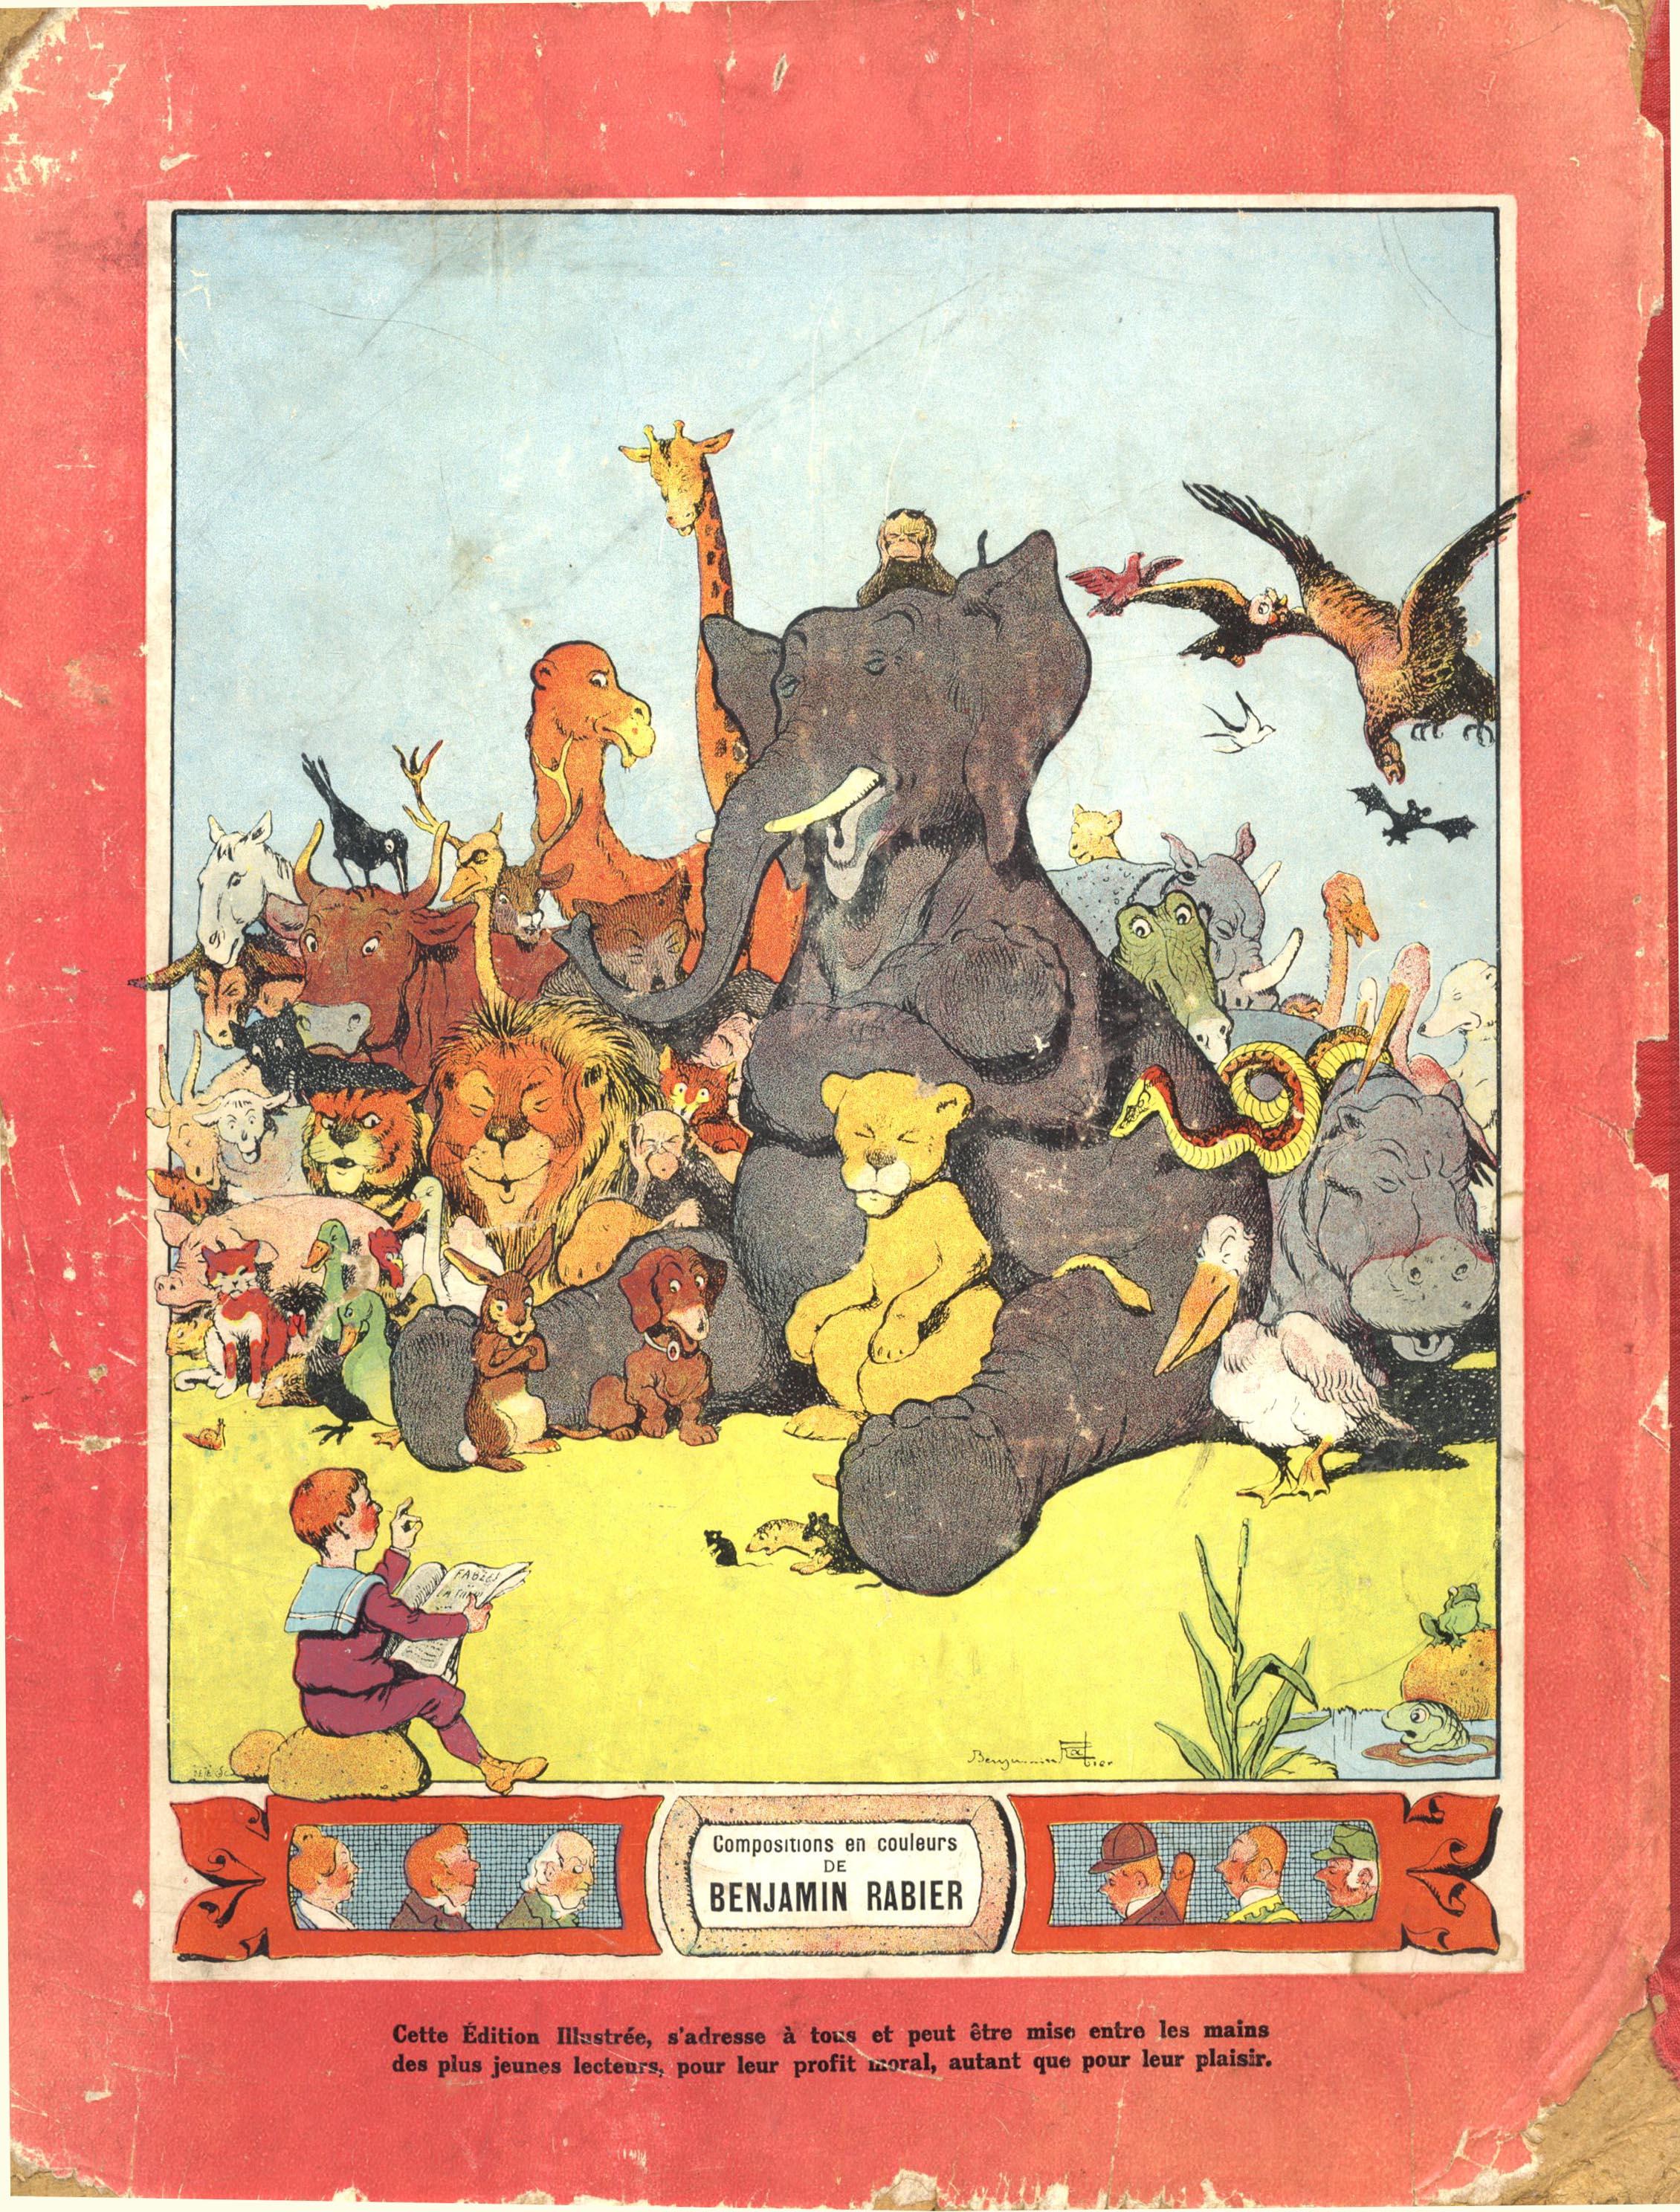 Benjamin Rabier, Fables de la Fontaine, 1906 Covers and Contents